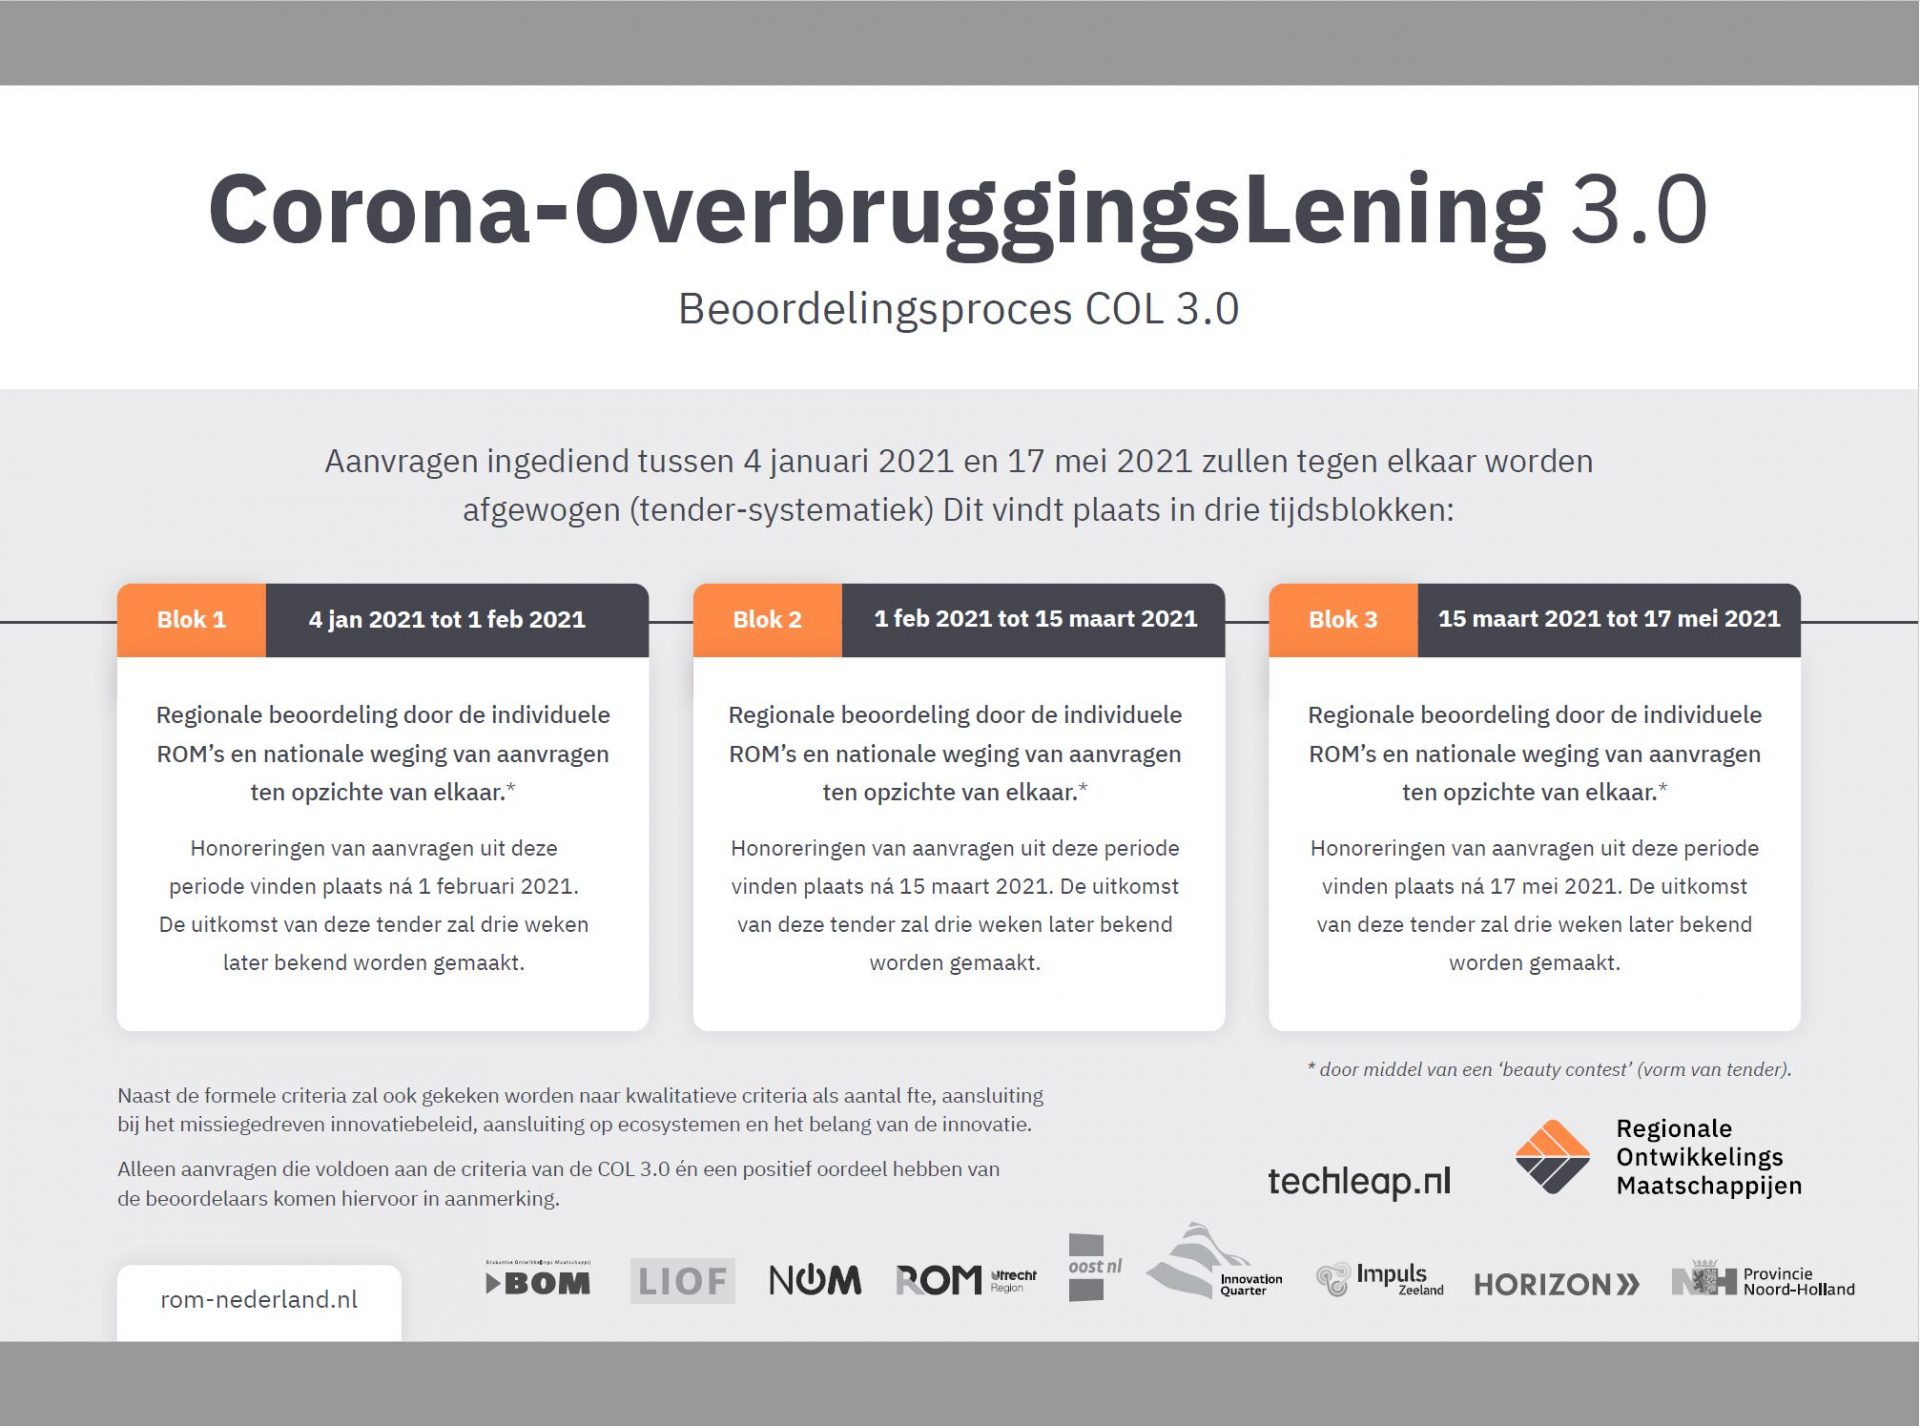 Aanvraagportal Corona-OverbruggingsLening vanaf 4 januari open